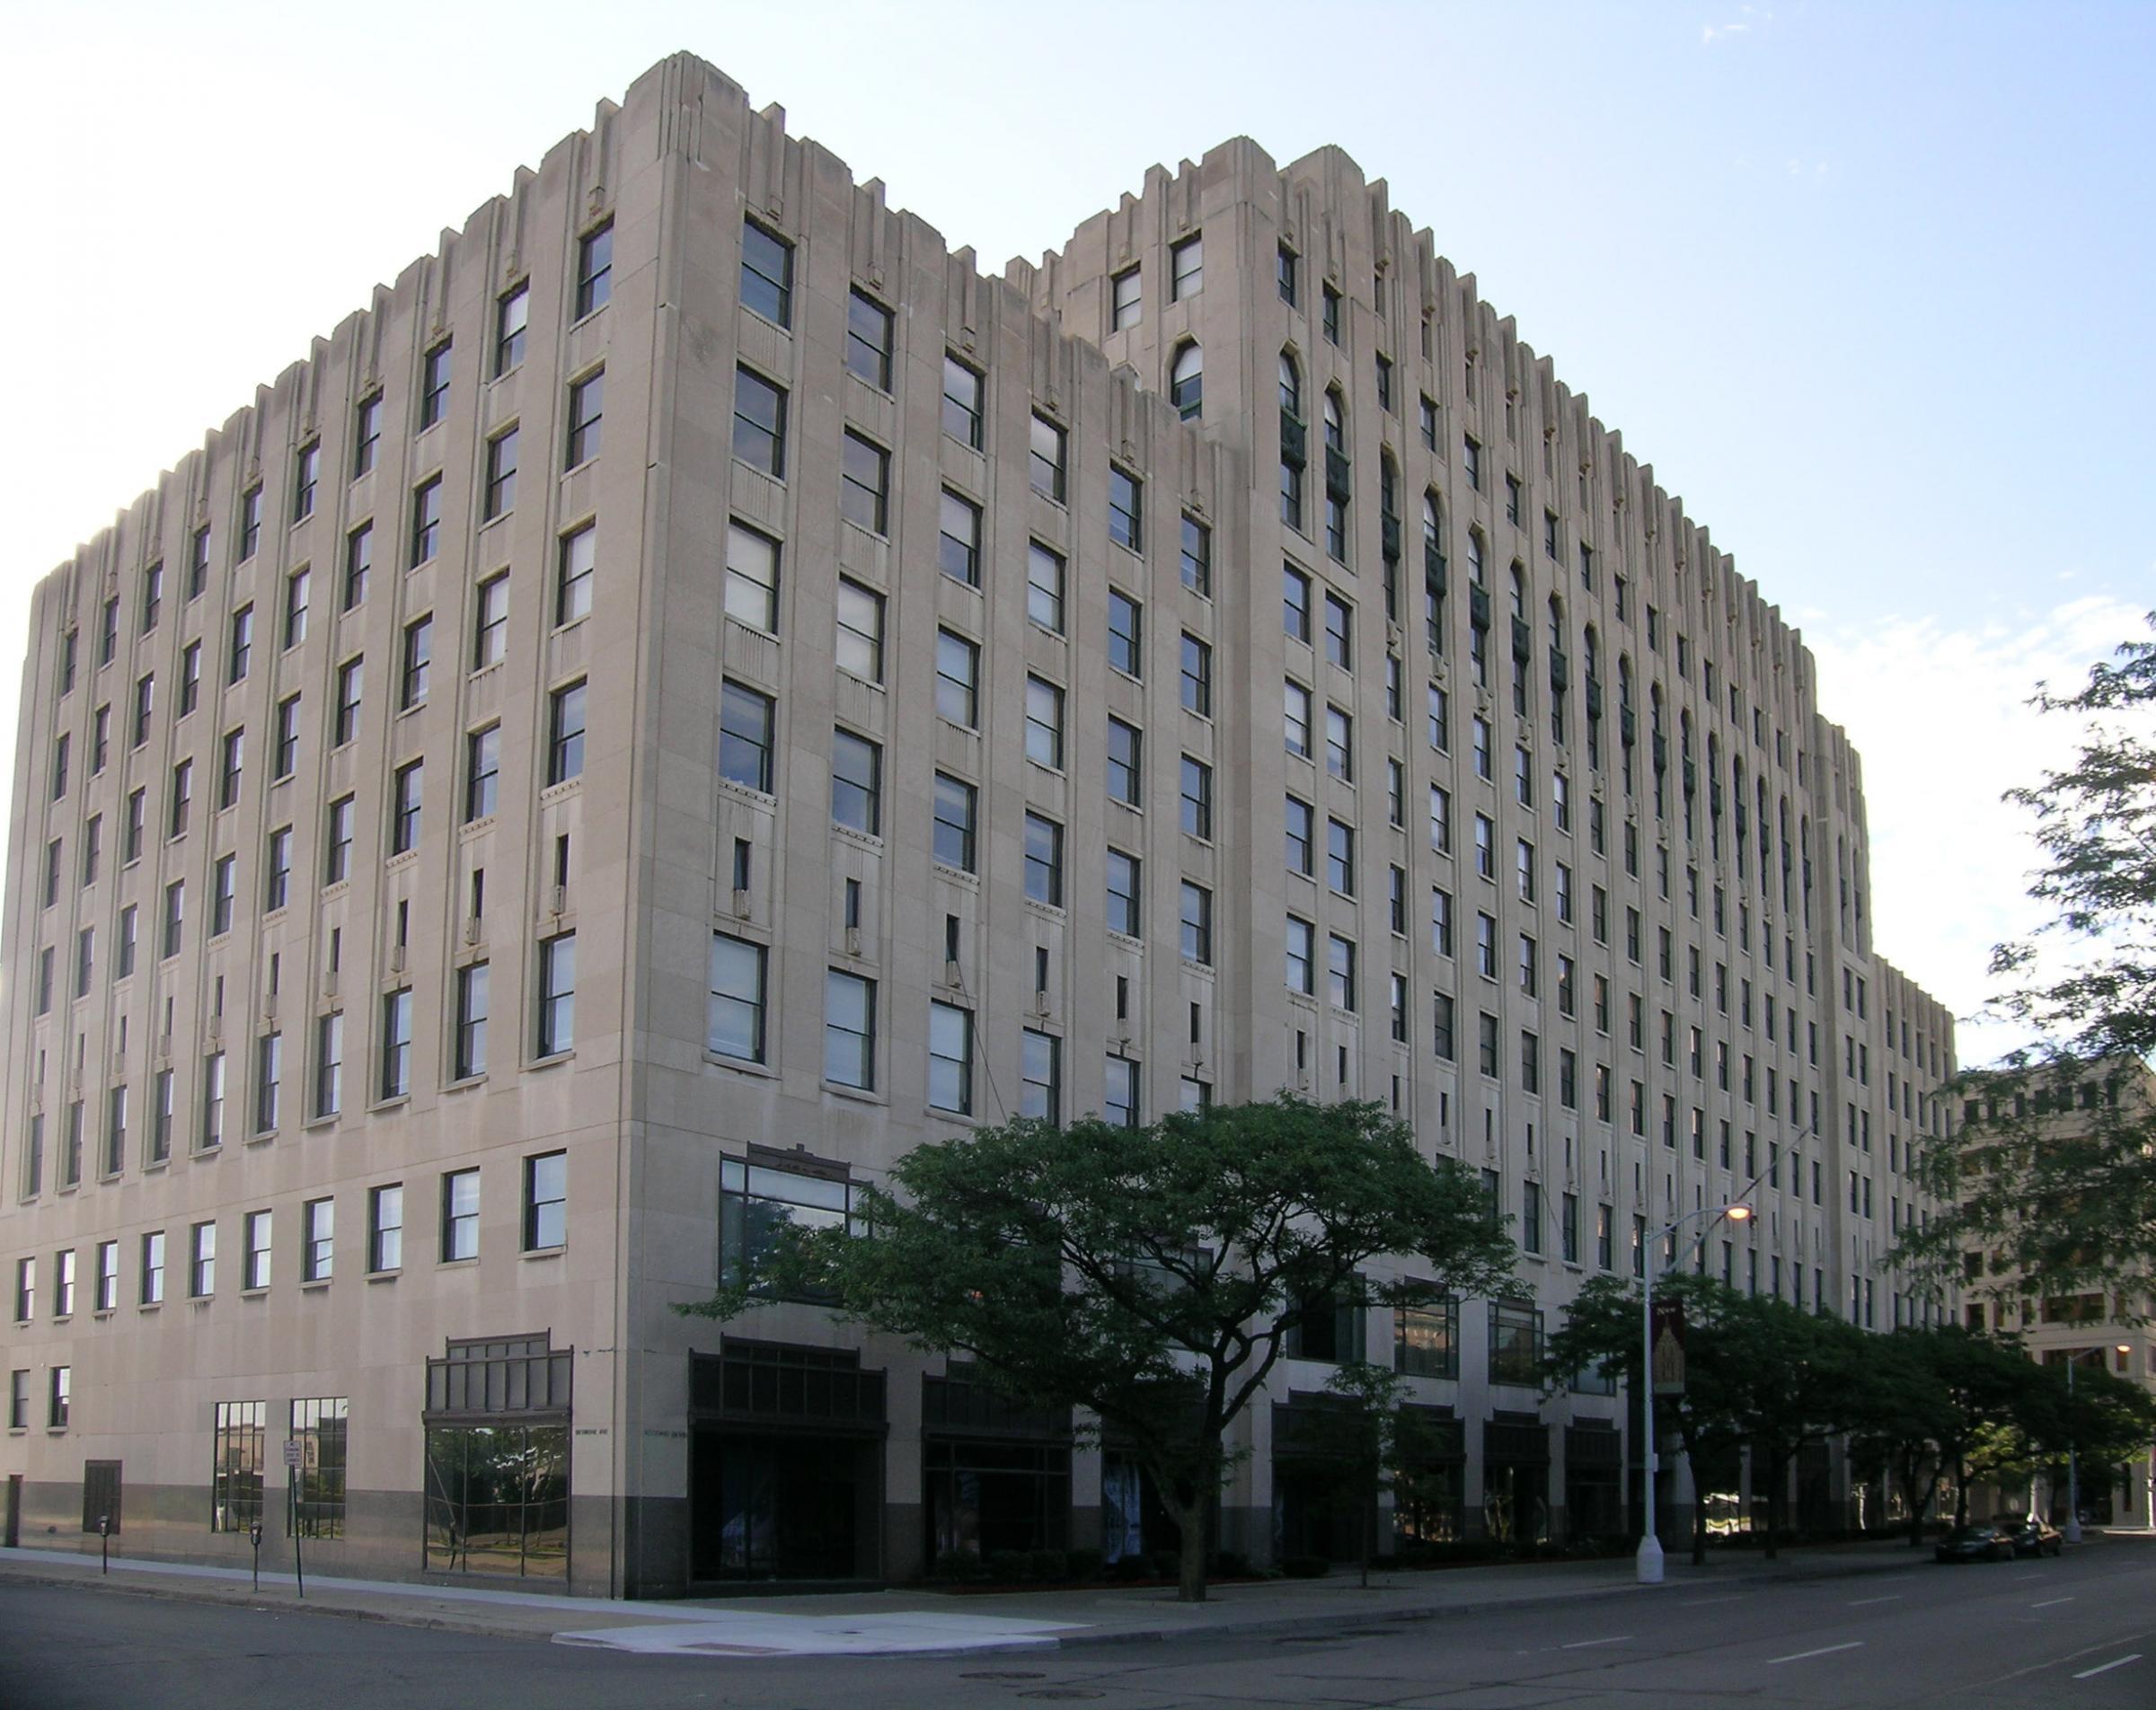 Albert kahn the architect of detroit michigan radio for Home building companies in michigan